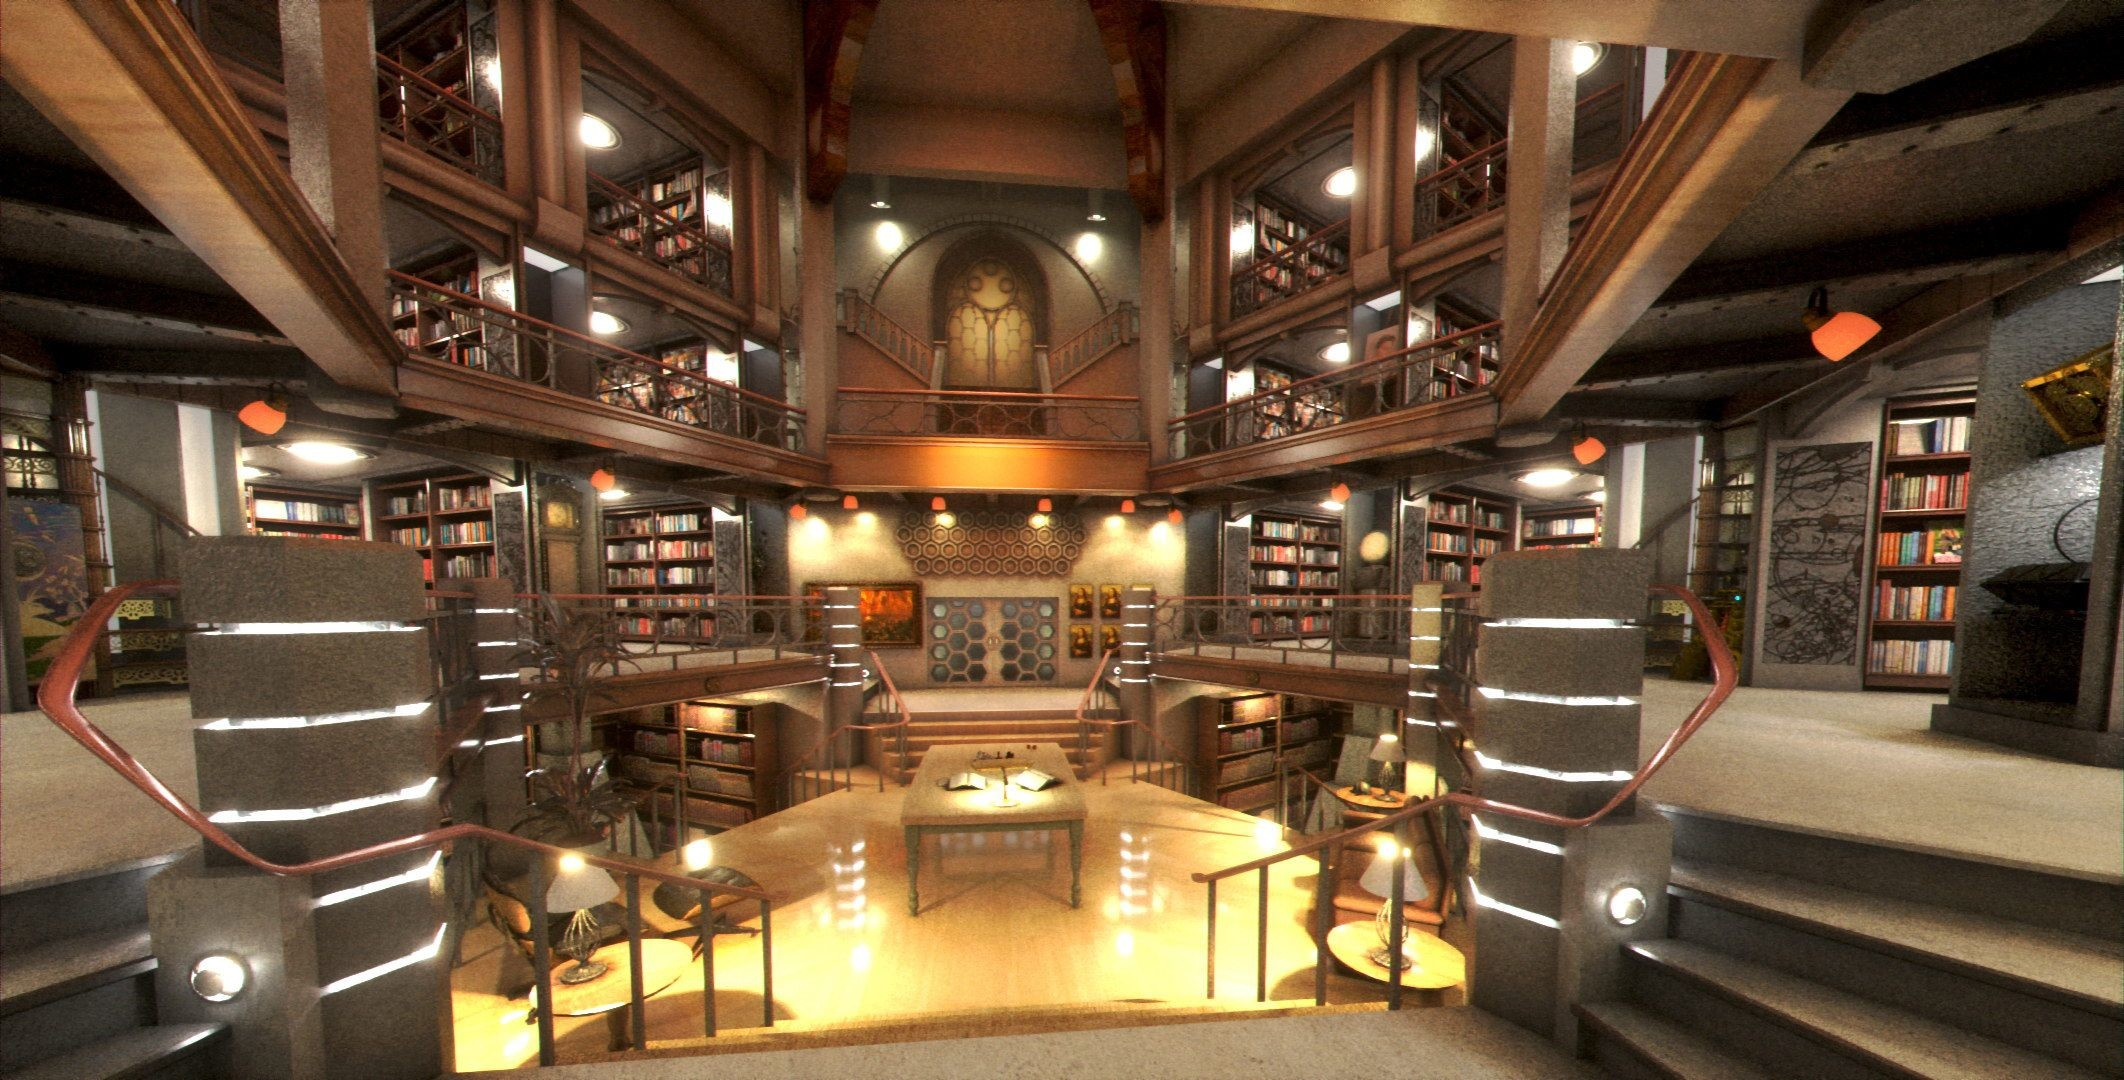 Tardis 2015 interior custom robs 3d doctor who site here eventelaan Choice  Image